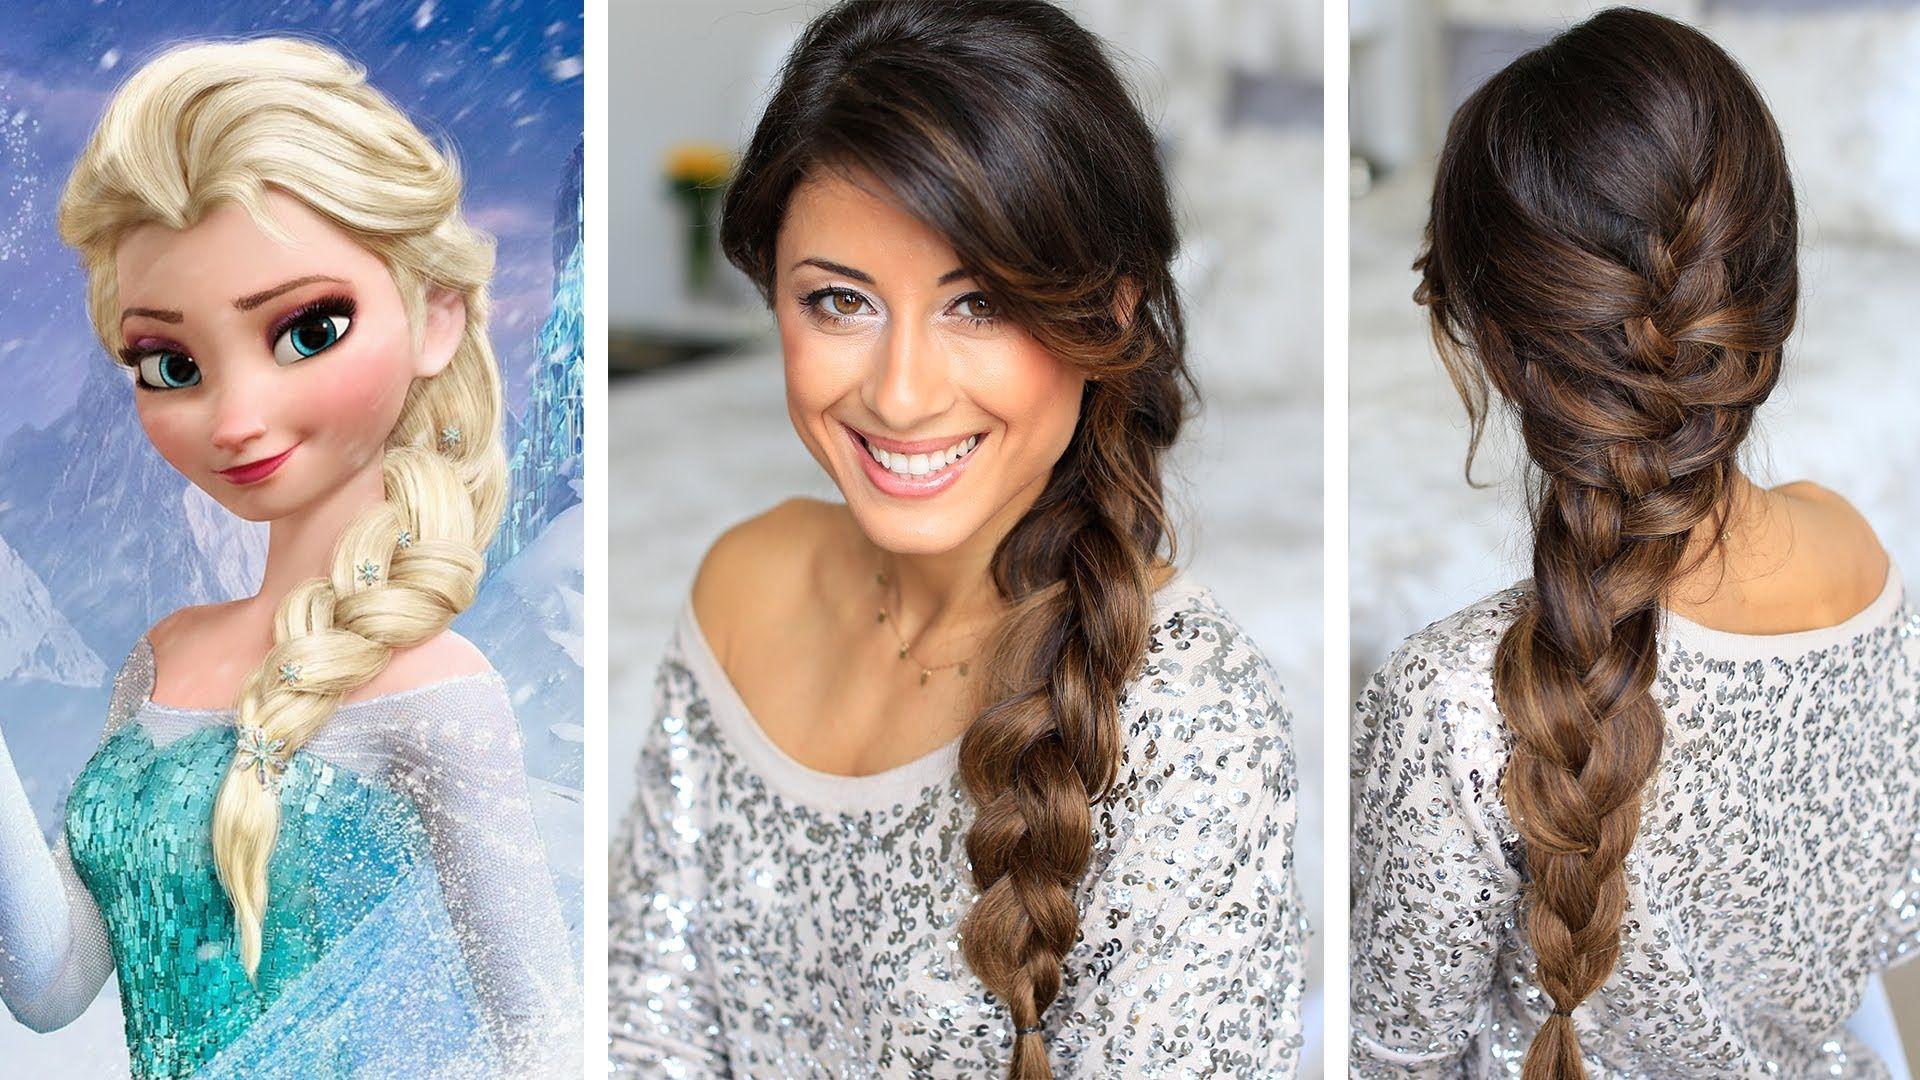 Frozen Elsa S Braid Hair Tutorial Luxy Hair Long Thick Hair Check I Can Do A Loose French Braid Frozen Hair Elsa Hair Hair Tutorial